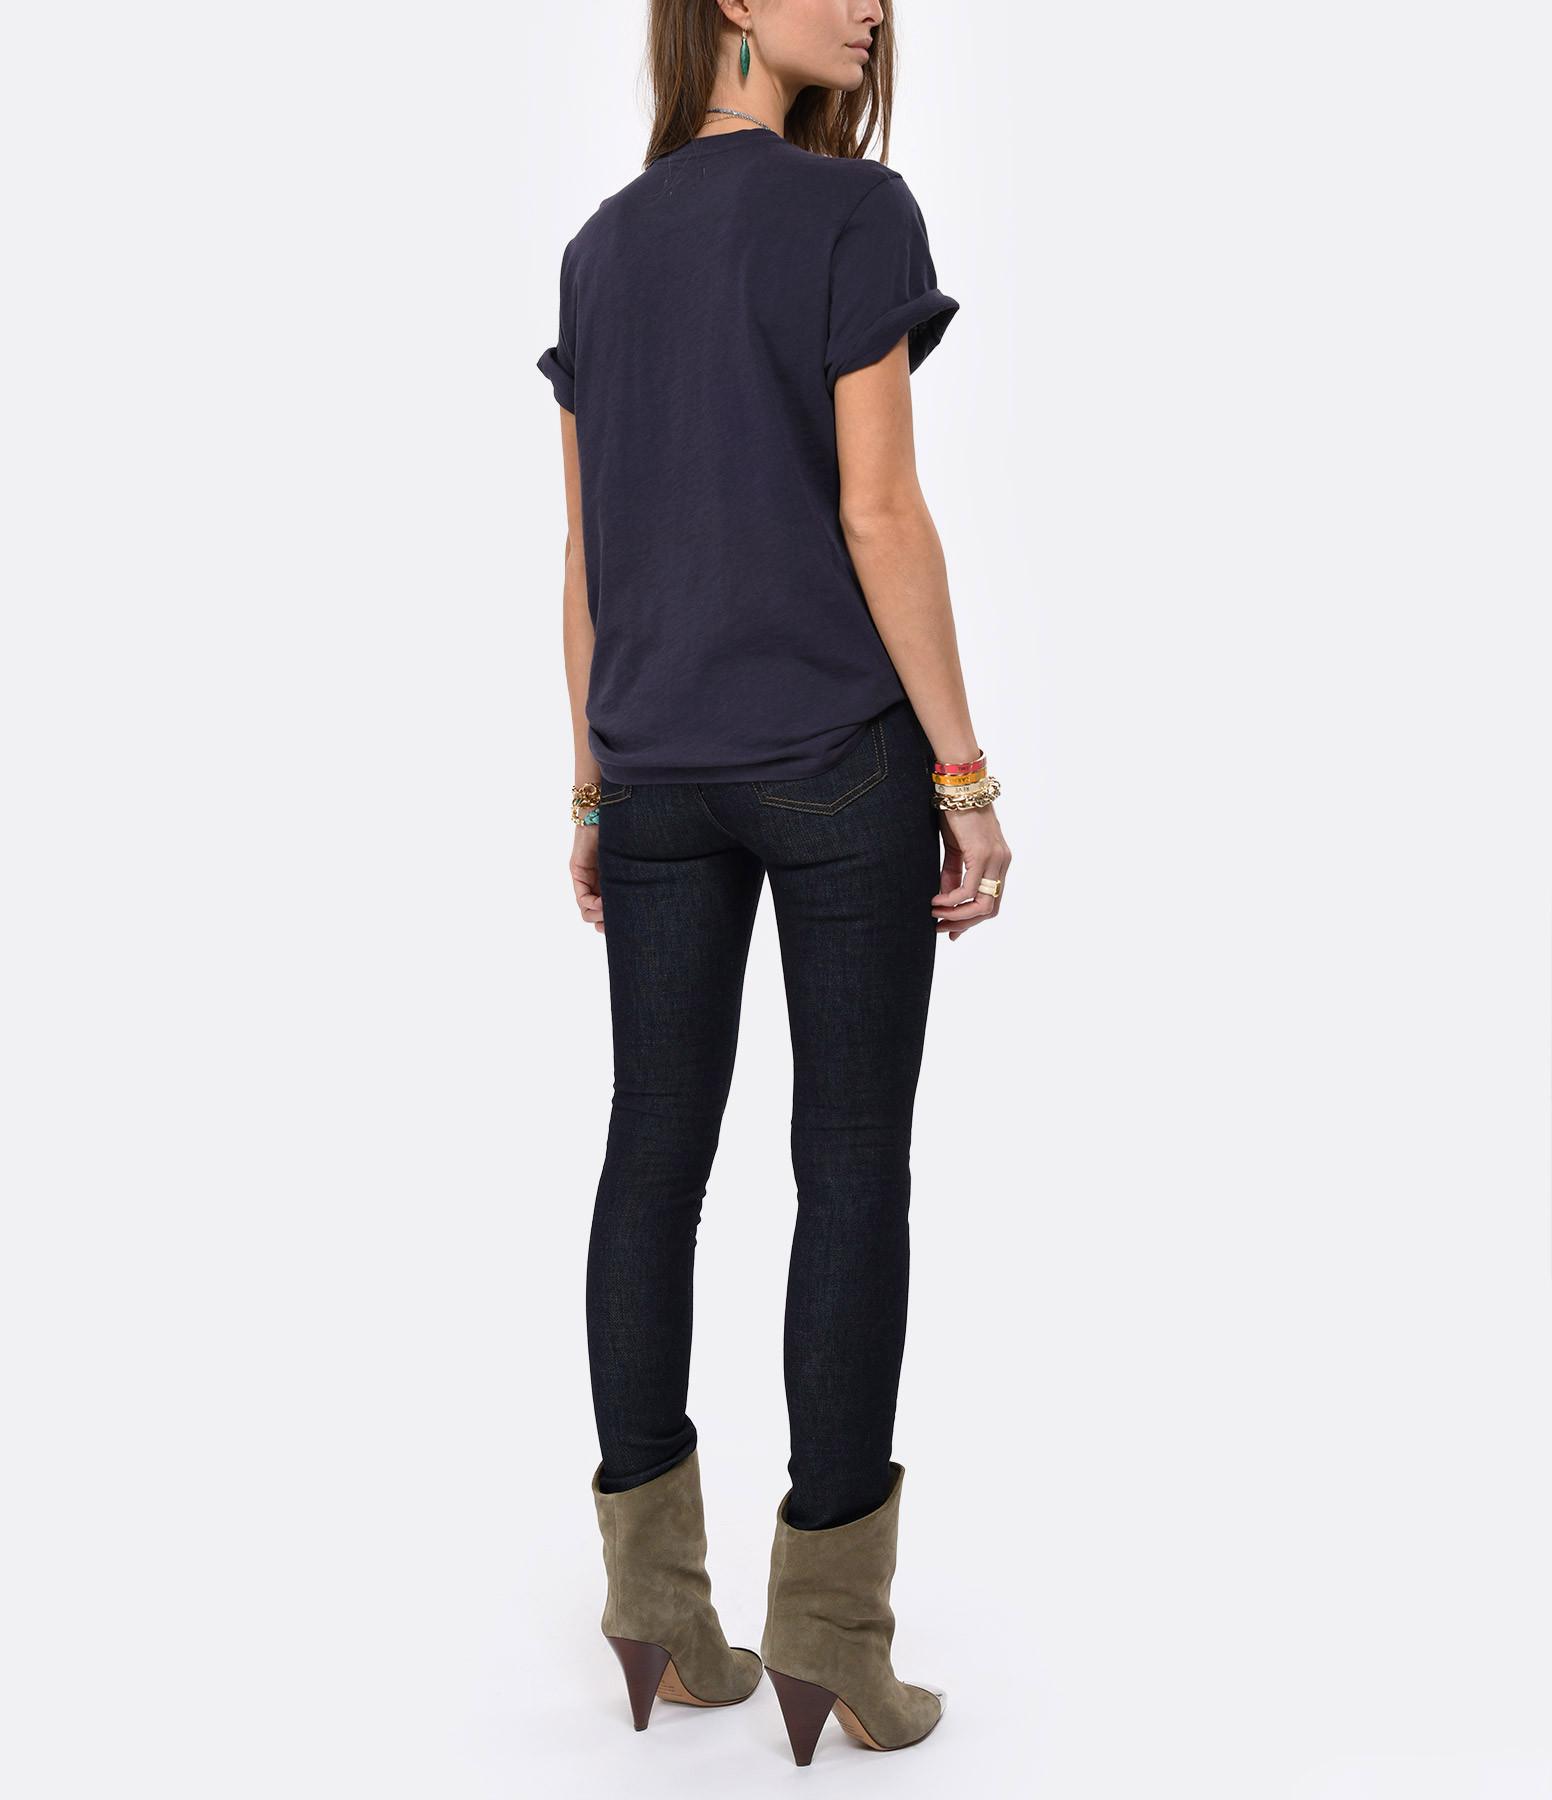 ISABEL MARANT ÉTOILE - Tee-shirt Zewel Coton Imprimé Bleu Nuit